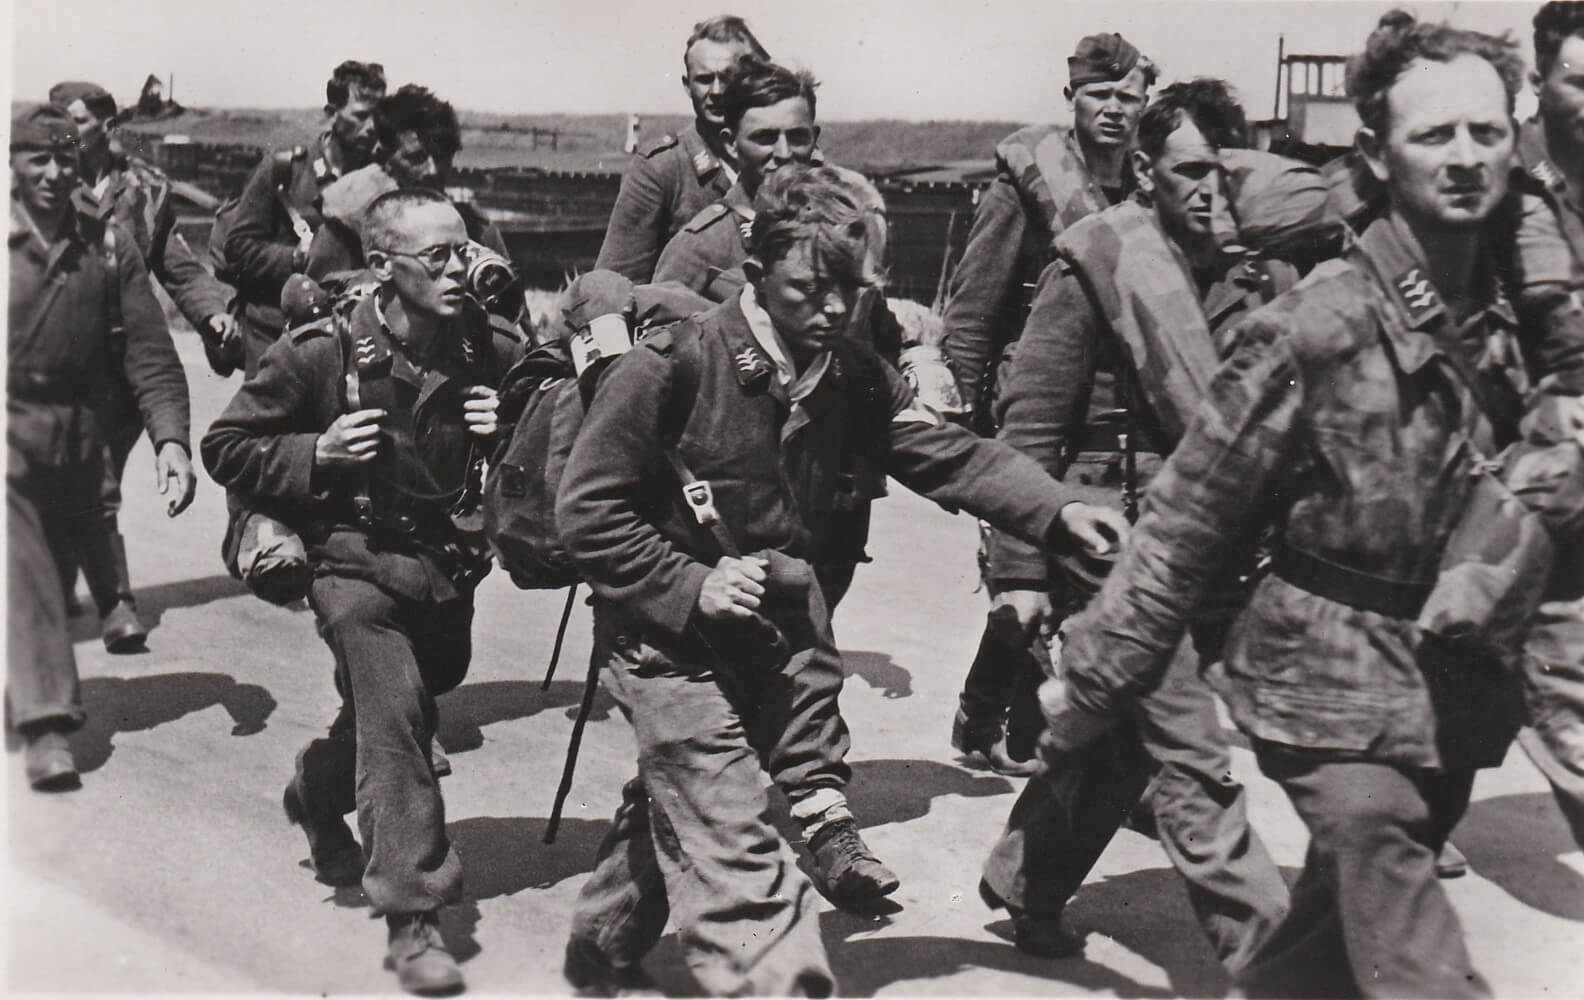 Luftwaffe Duitse soldaten Kaartenserie foto Uittocht der Edel Germanen